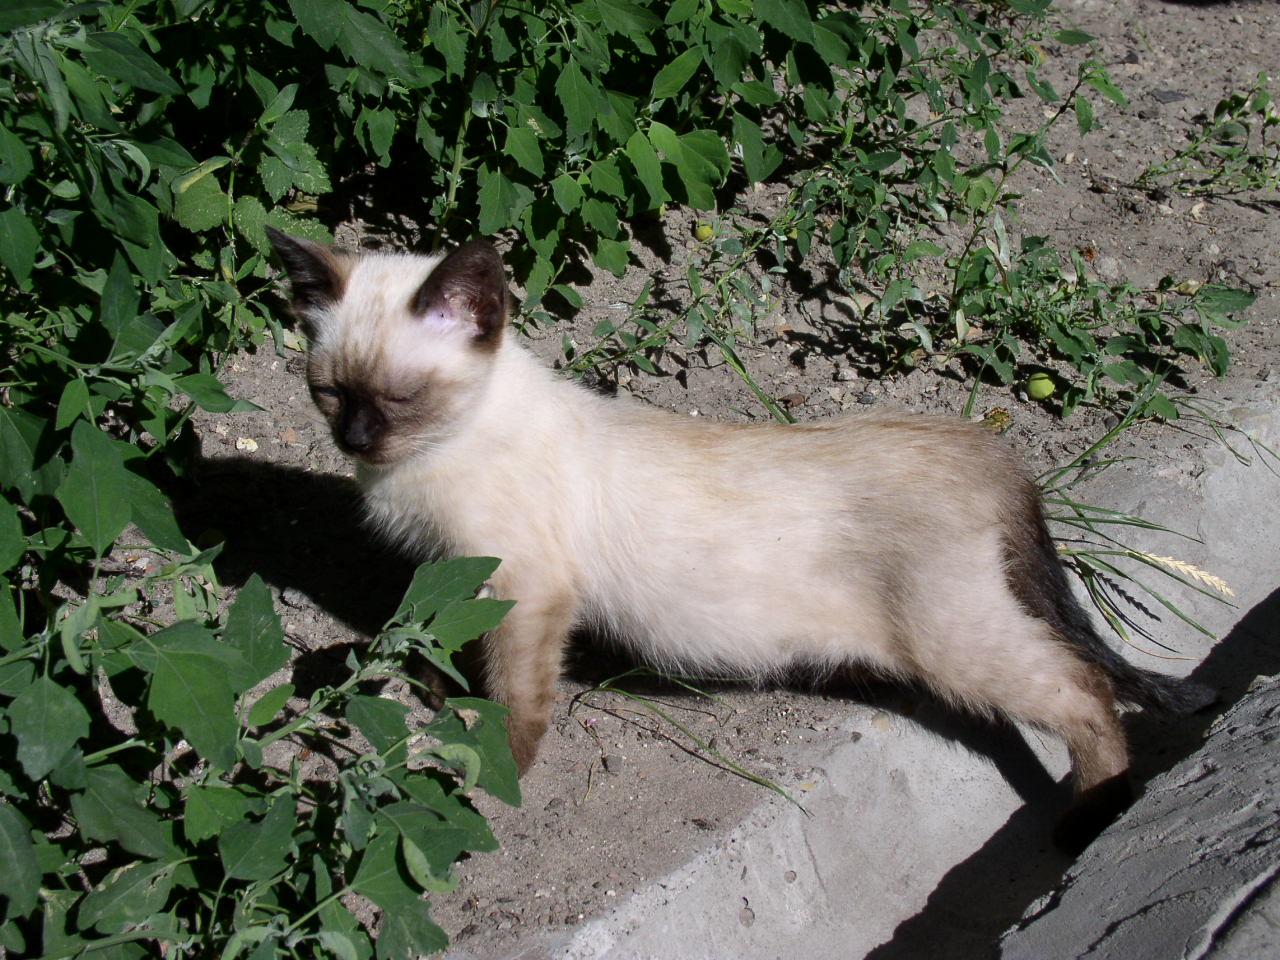 crazy cat lady pic